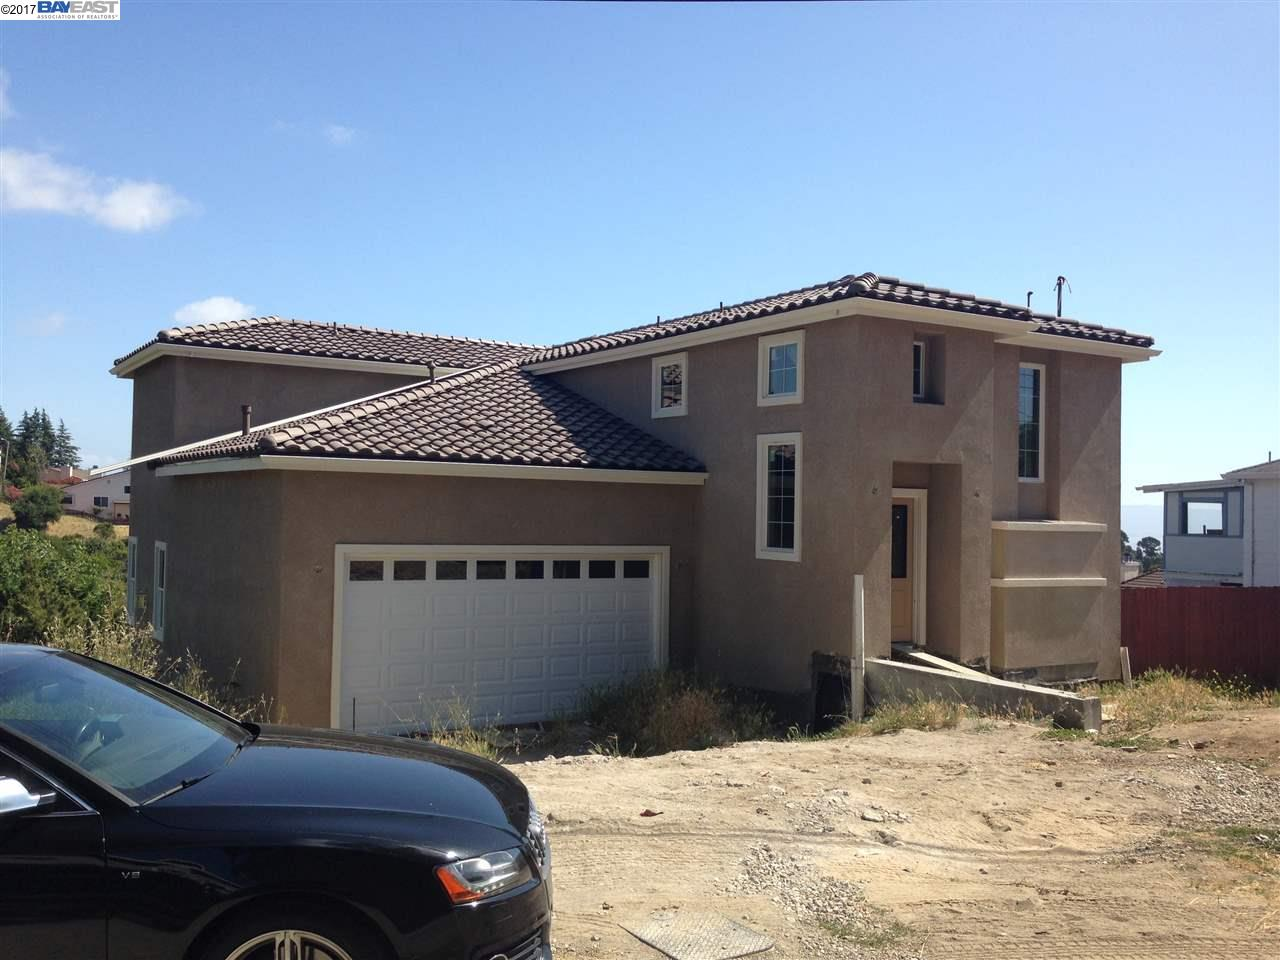 3097 Chronicle Ave, HAYWARD HILLS, CA 94542